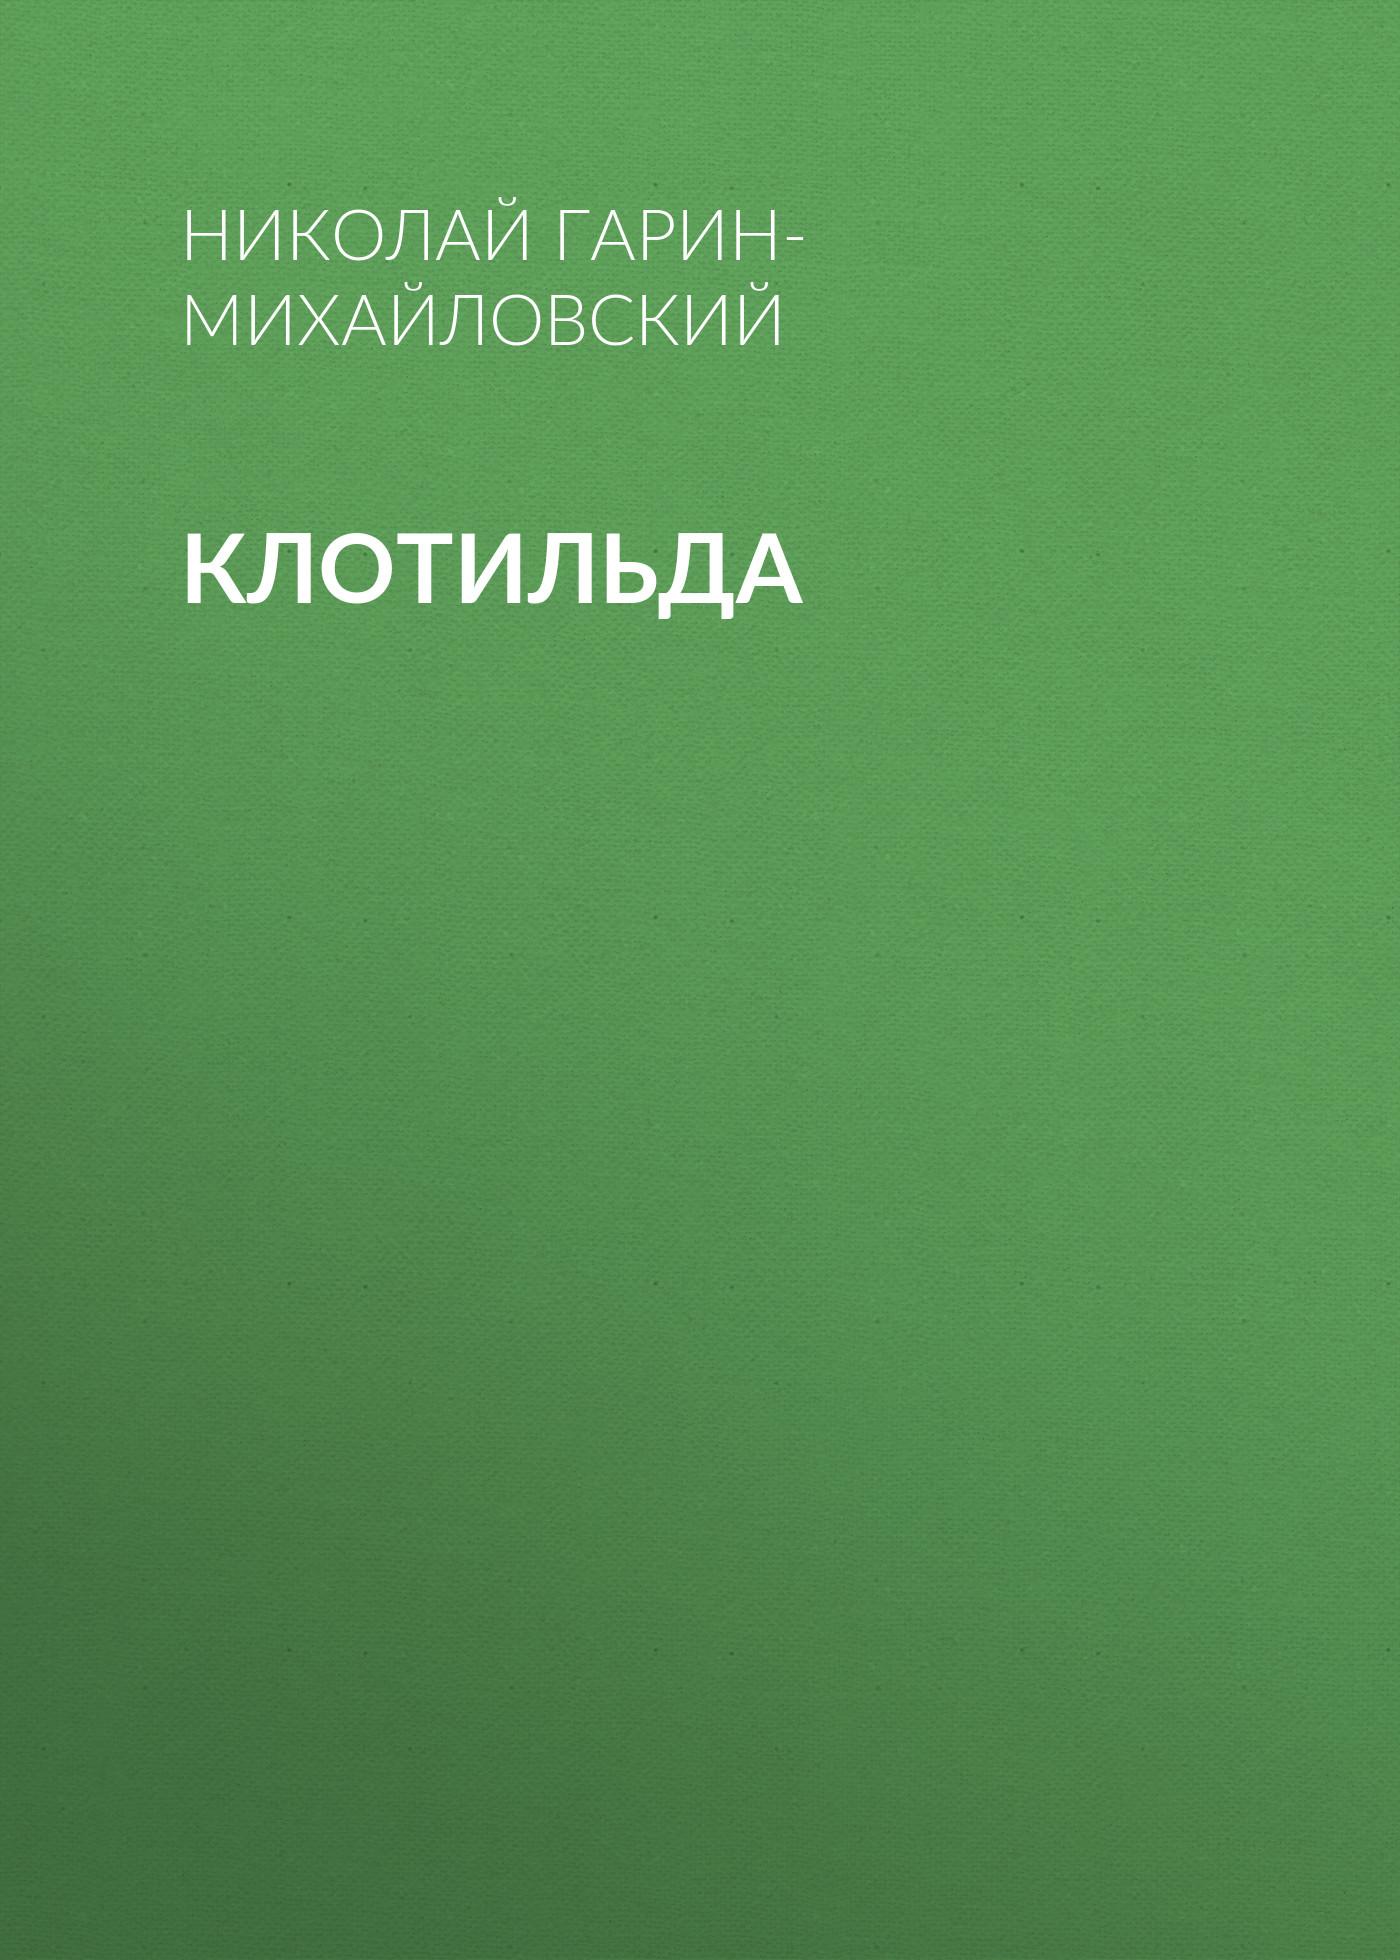 Николай Гарин-Михайловский Клотильда авиабилеты цены рейсы до бургаса